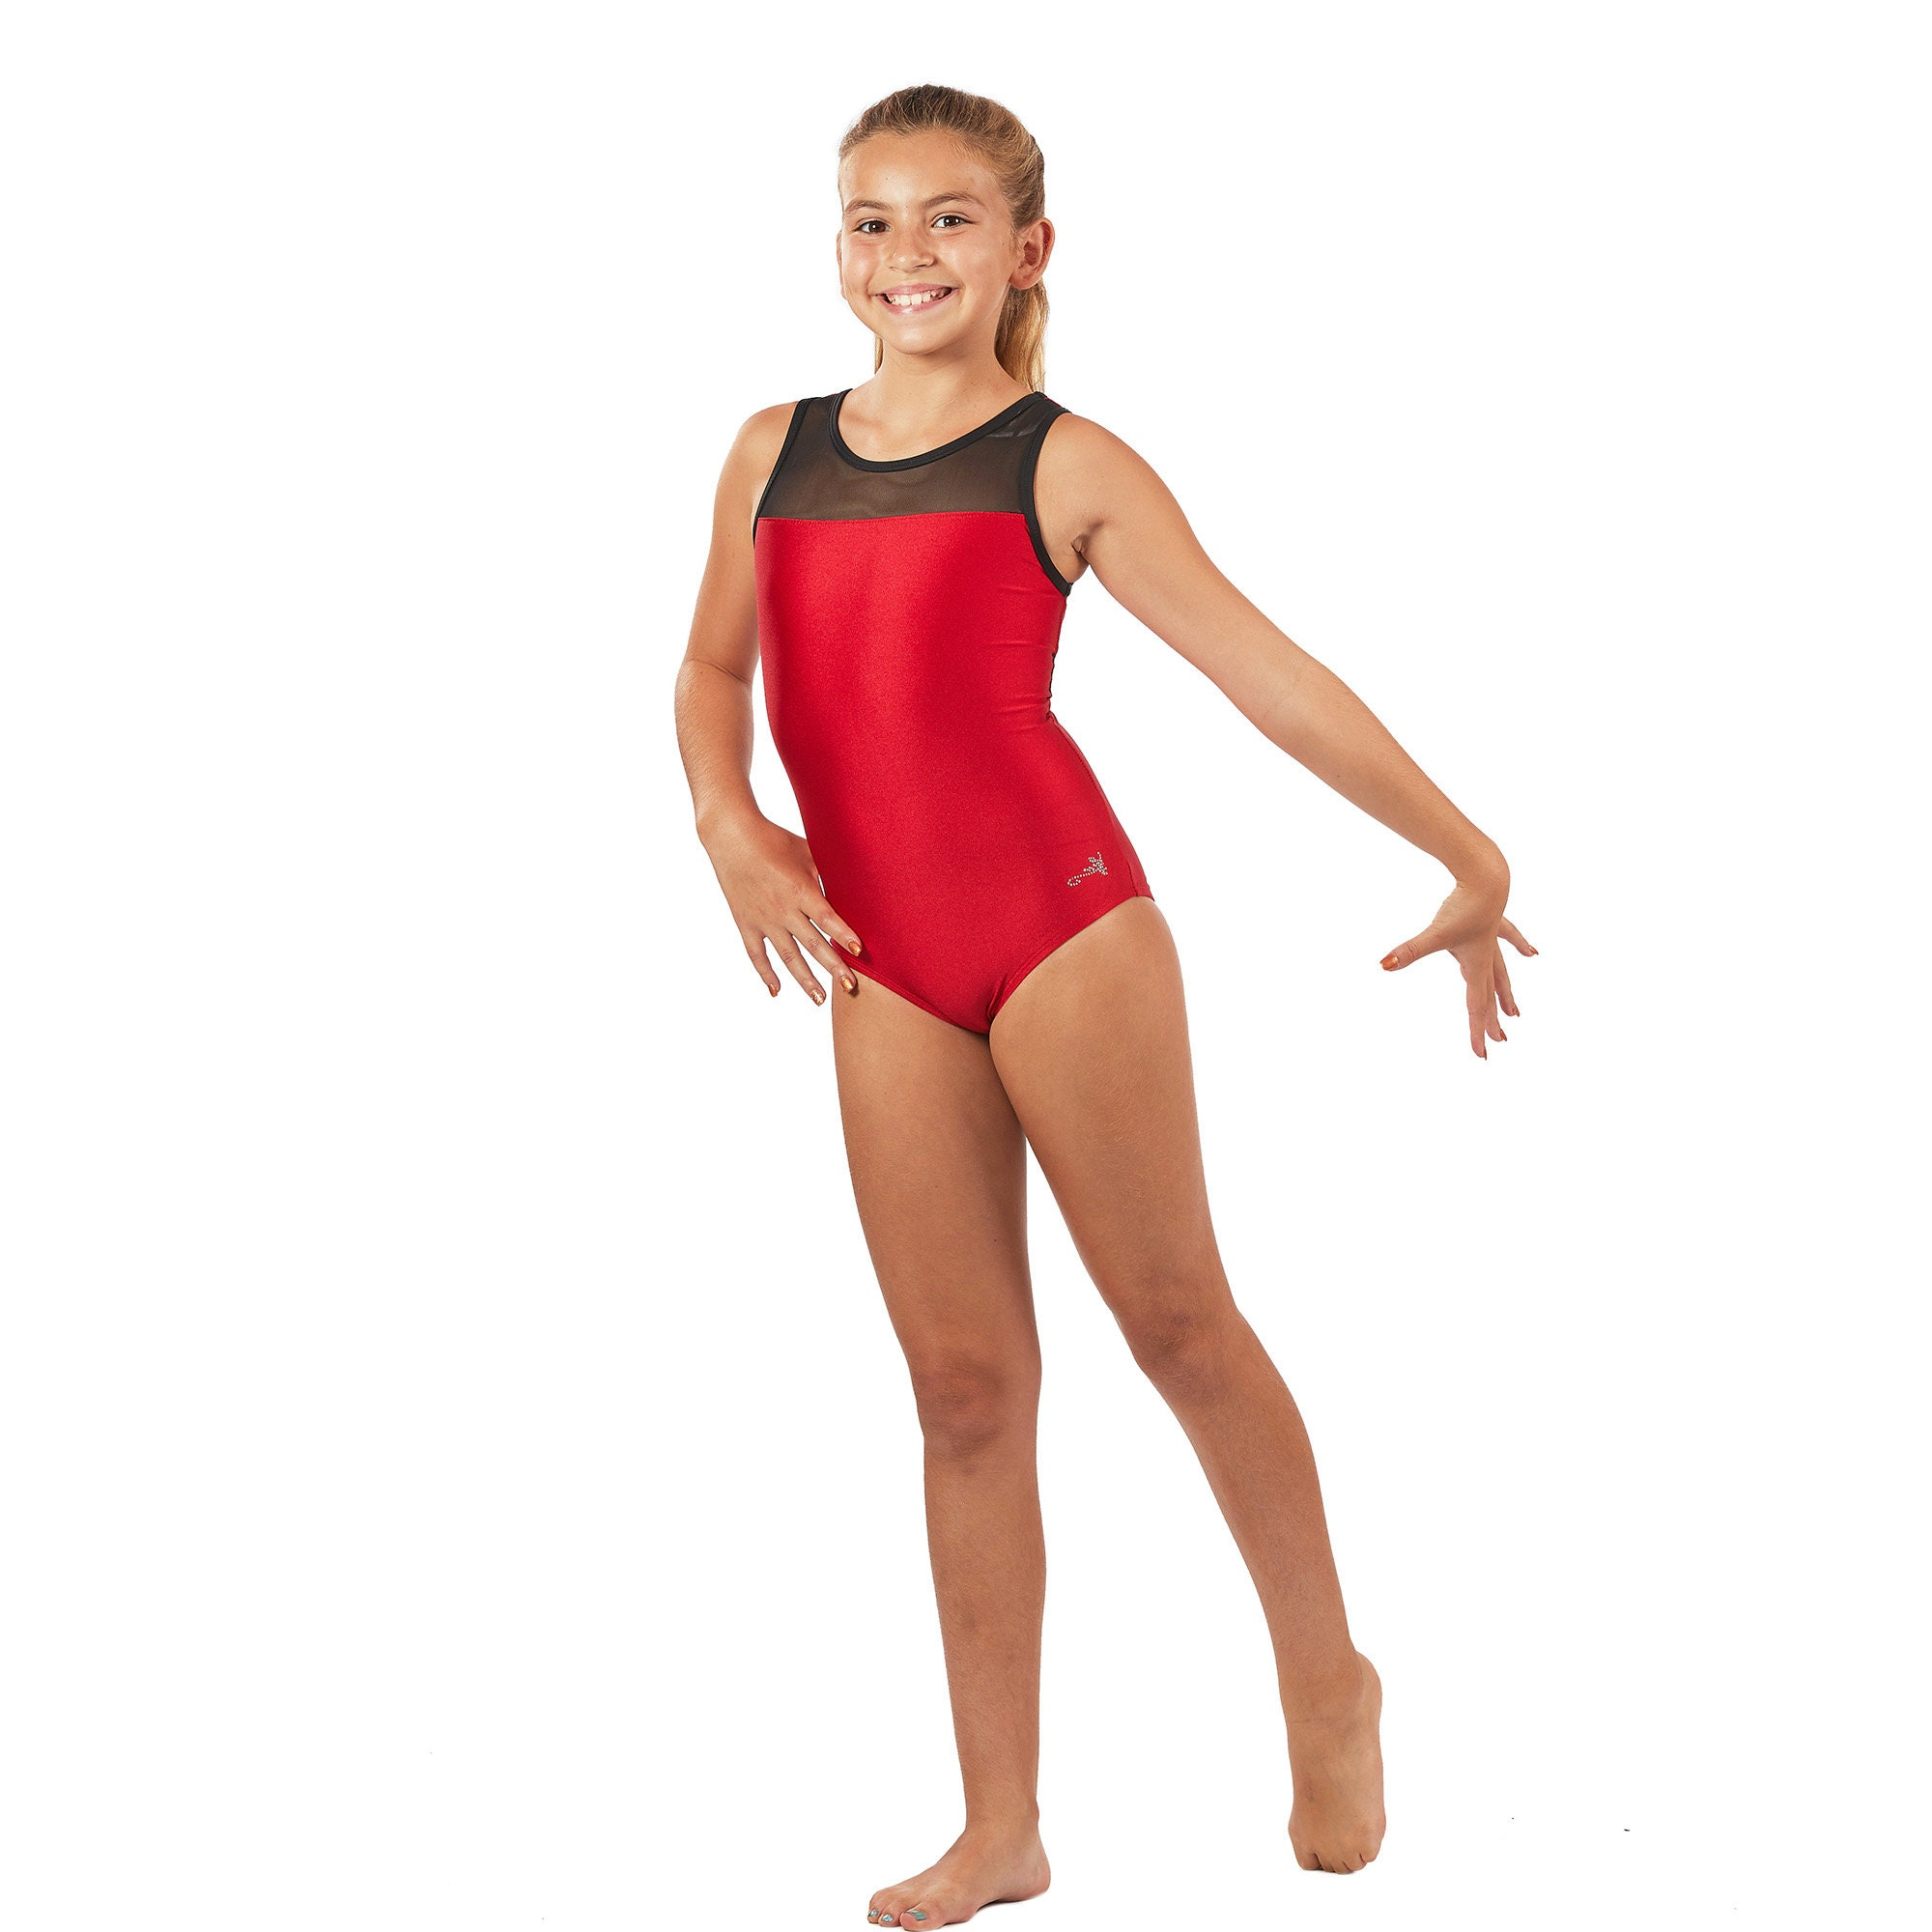 young-girls-bikini-gymnastics-maria-ozawa-moaning